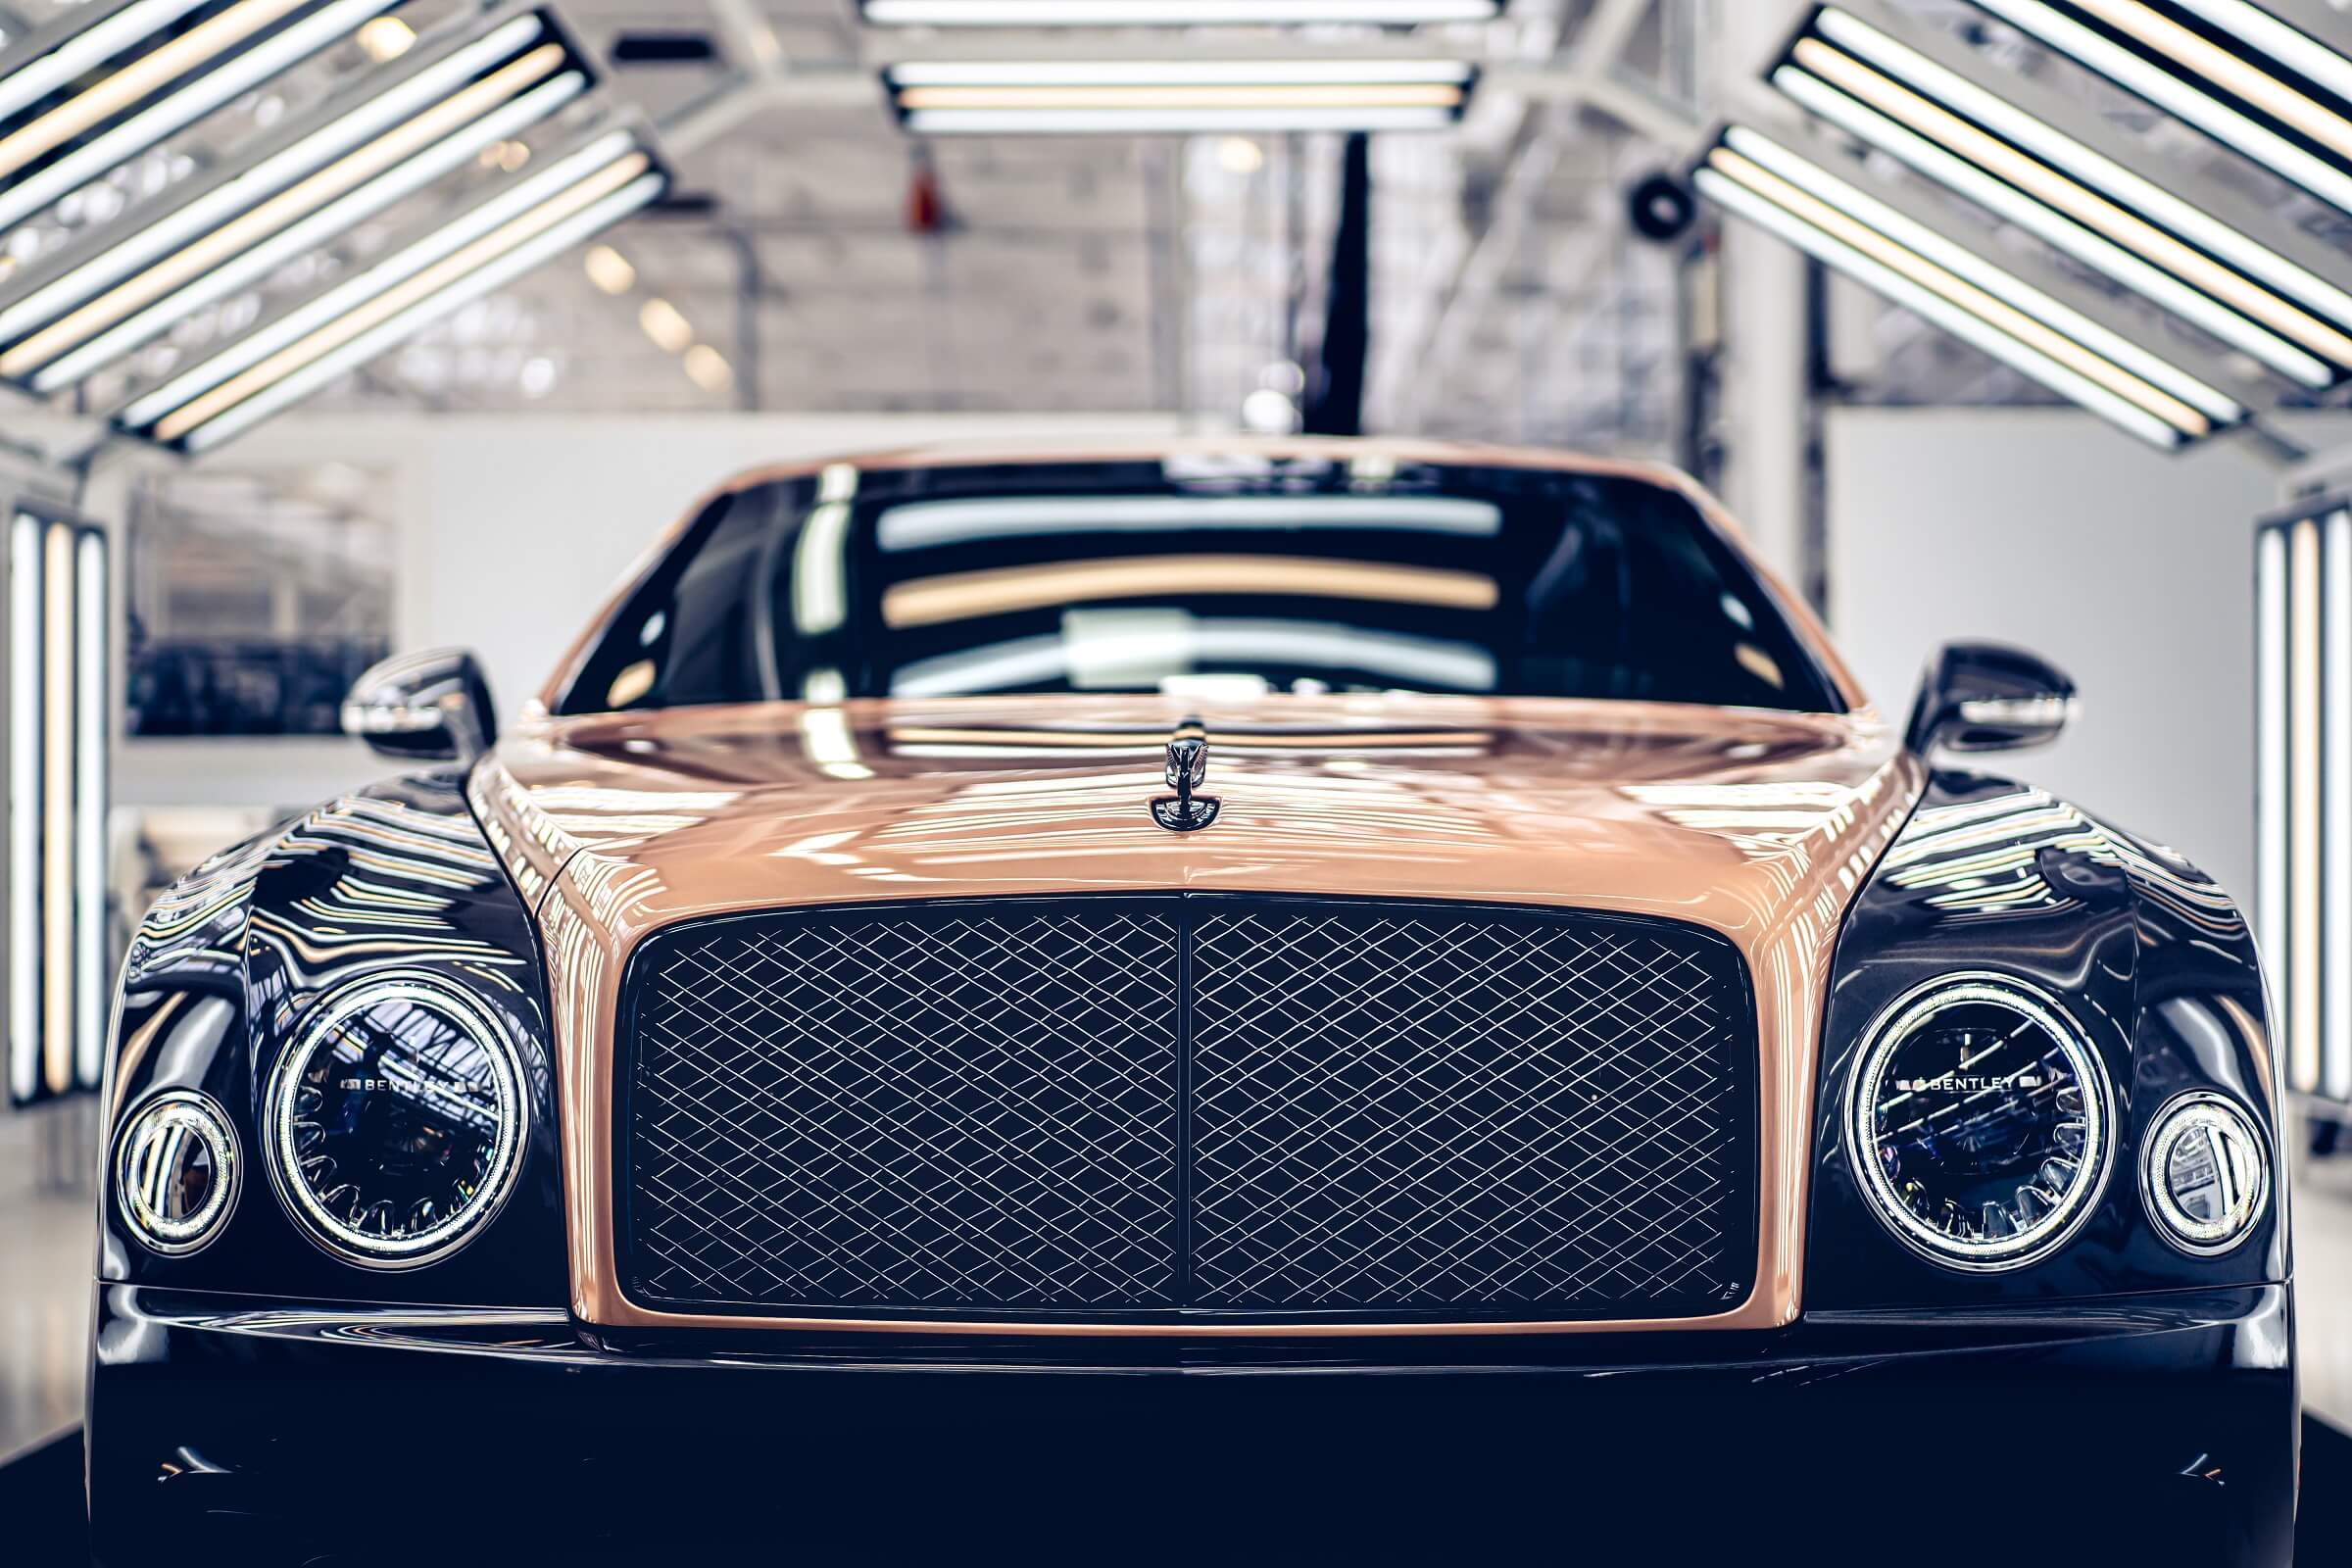 Bentley Mulsanne - Το τέλος μιας εποχής - Εμπρός όψη λεπτομέρεια